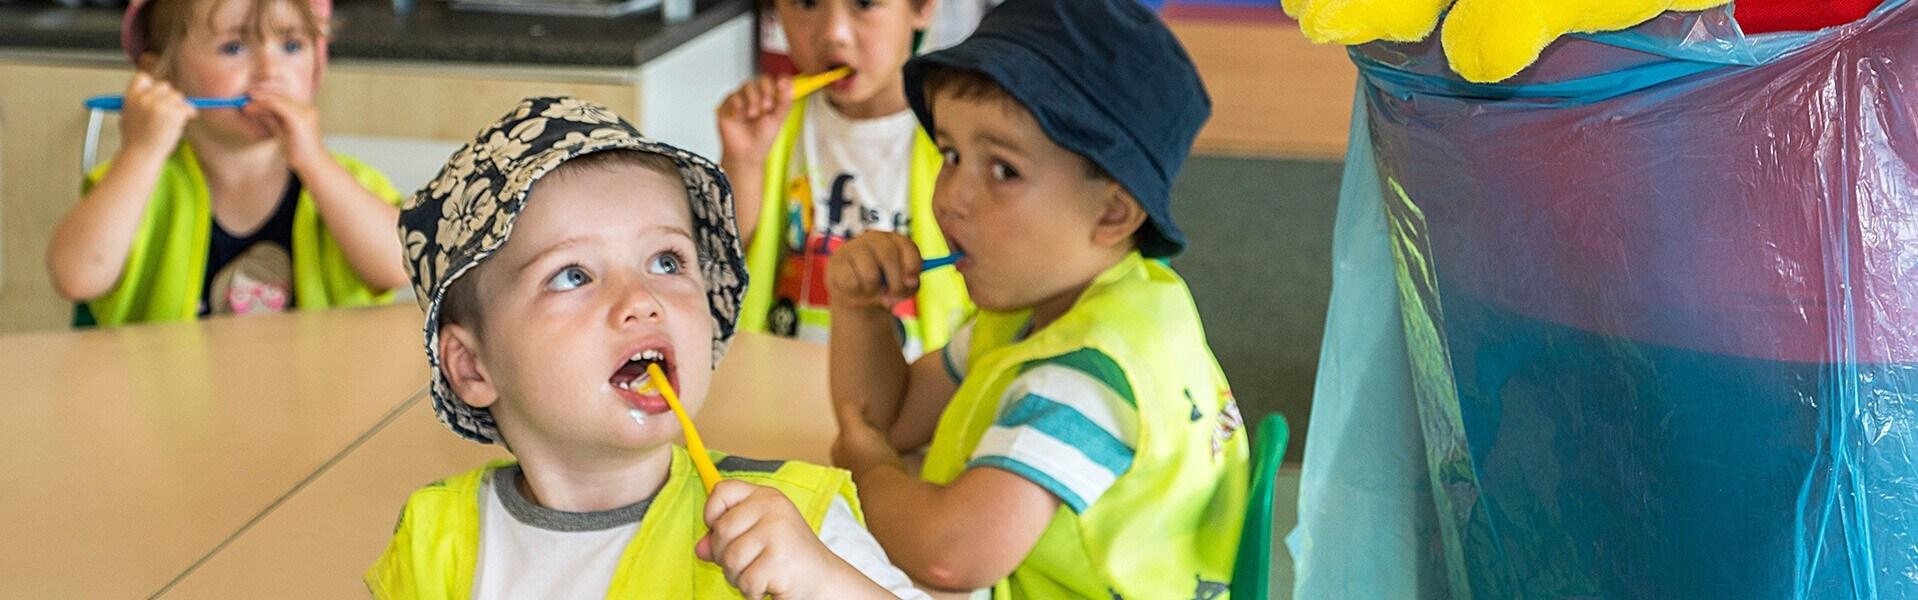 Rhydyfelin Nursery Child care